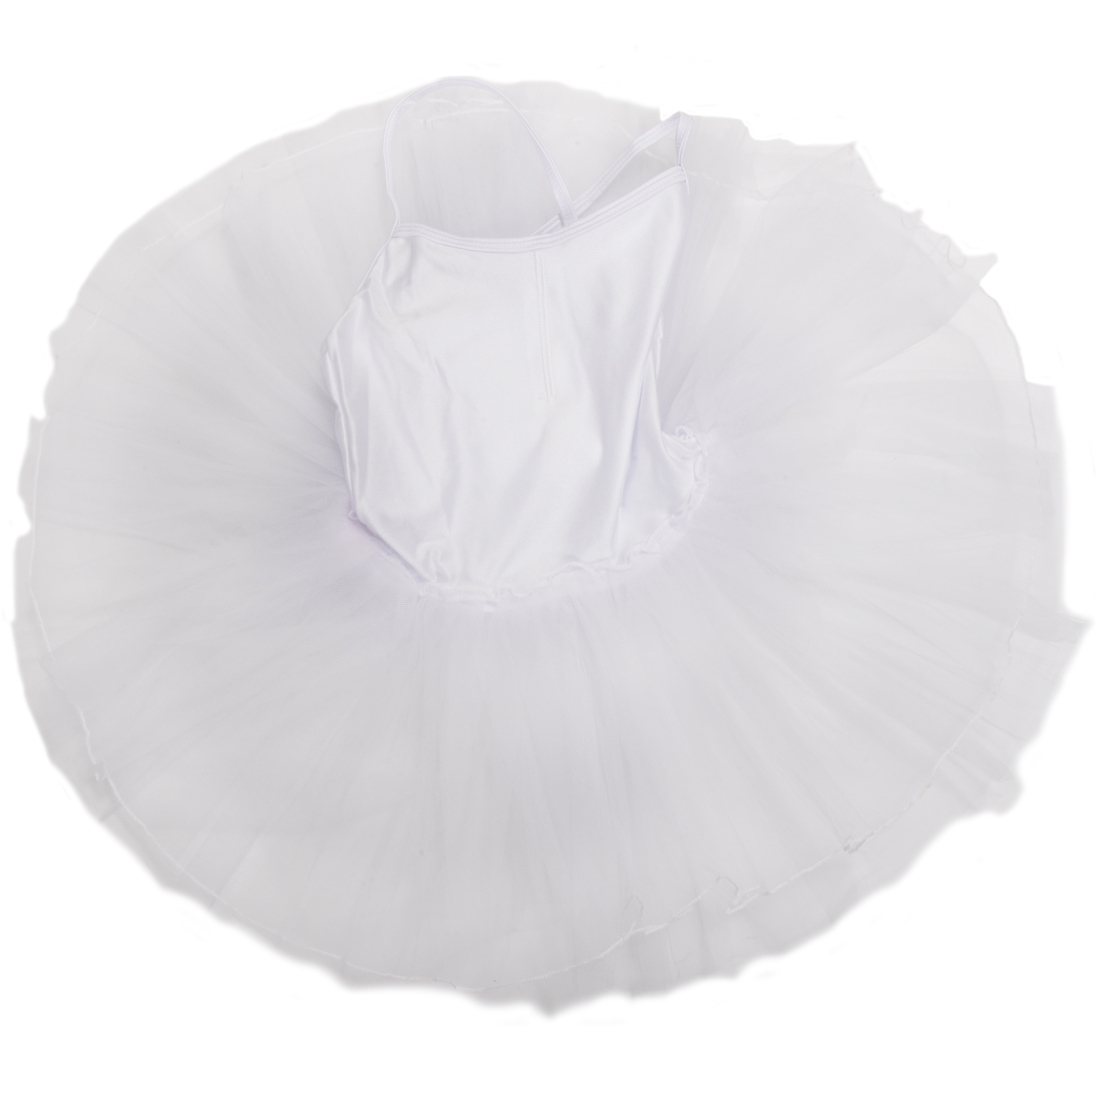 maedchen ballett tanz kleid gymnastik trikot hosentraeger tutu 5 6 jahre al u5x1 ebay. Black Bedroom Furniture Sets. Home Design Ideas